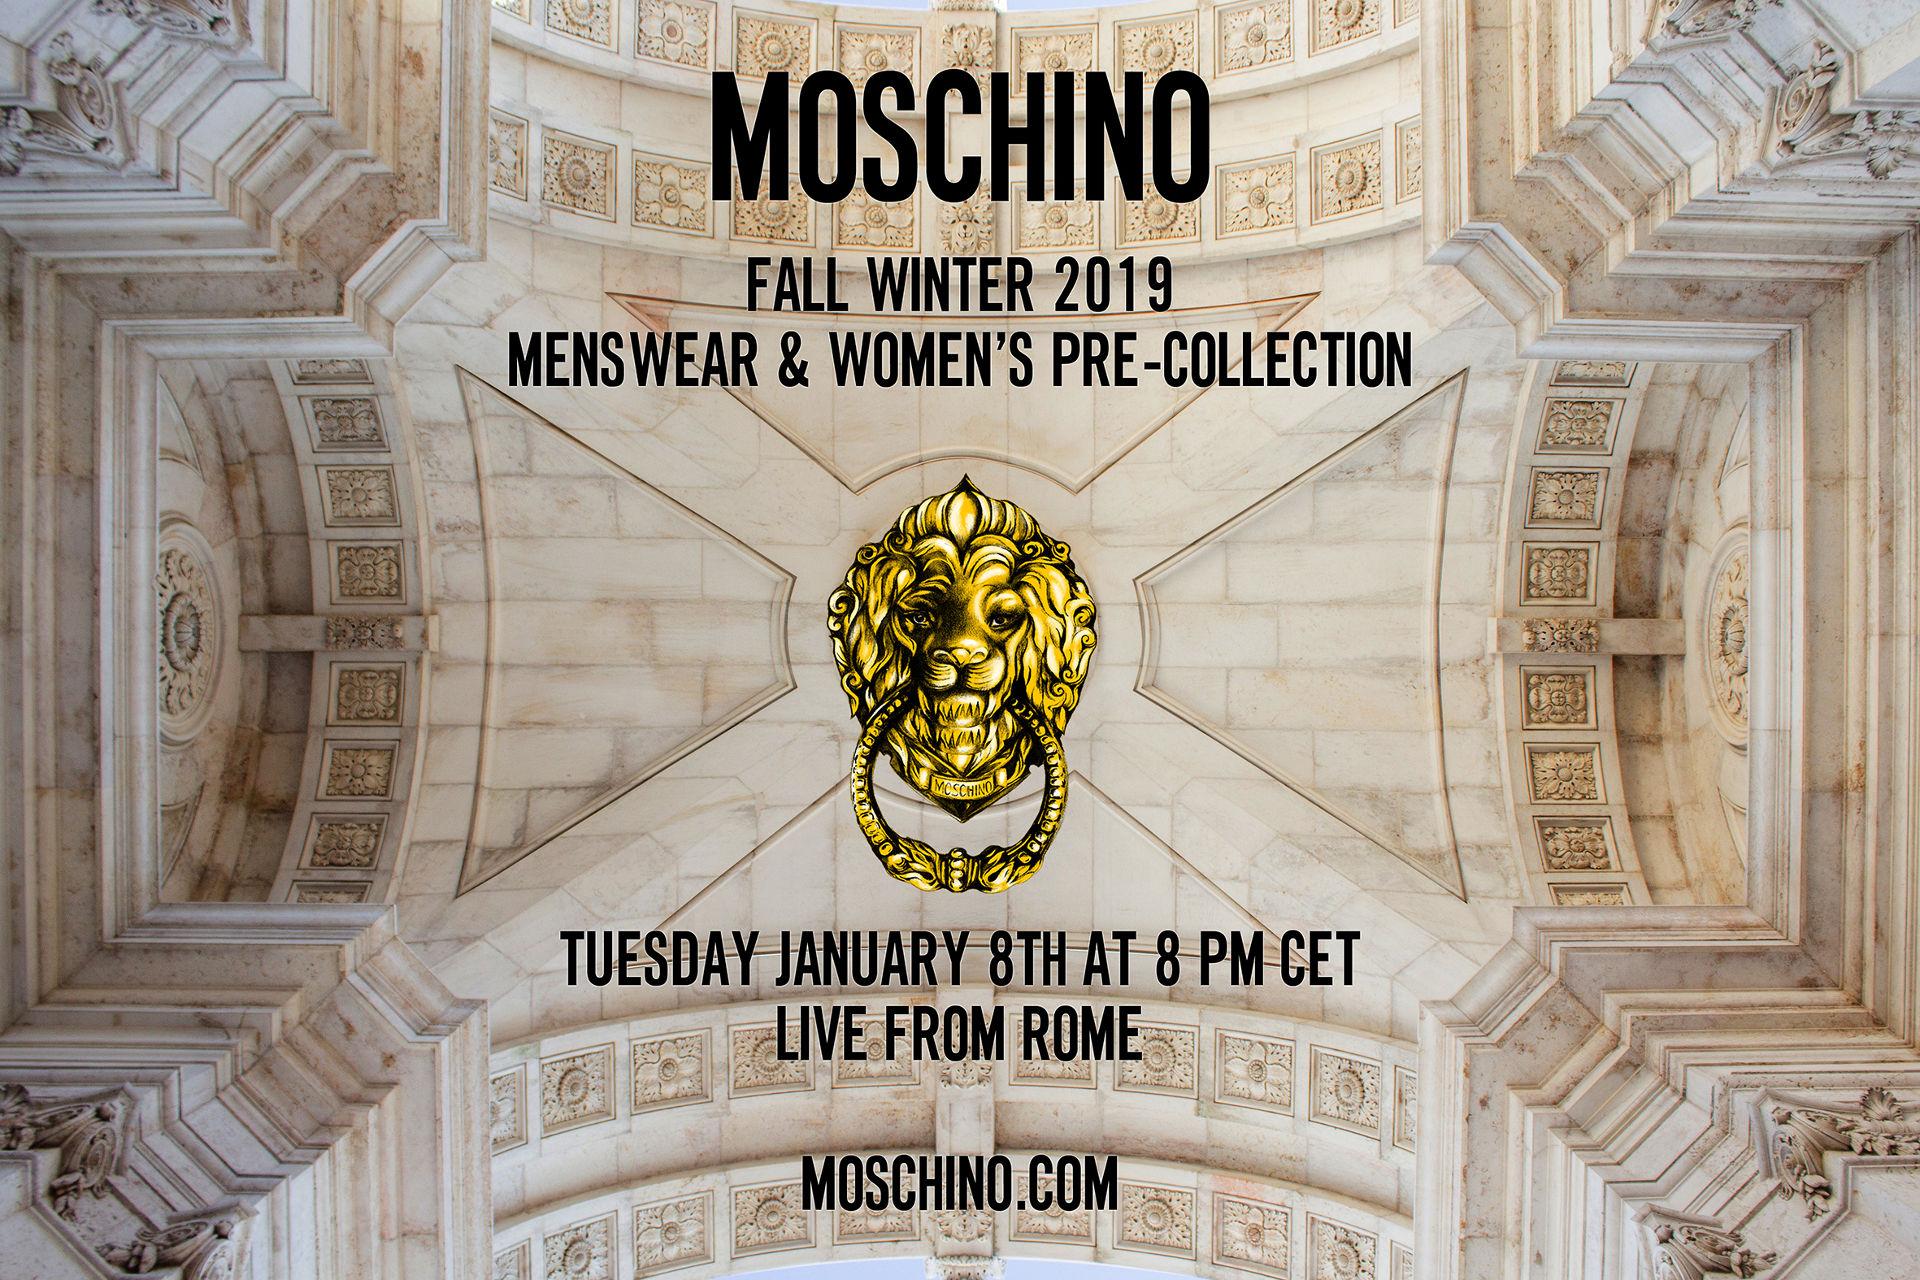 Moschino Fall Winter 2019 Fashion Show Live Streaming